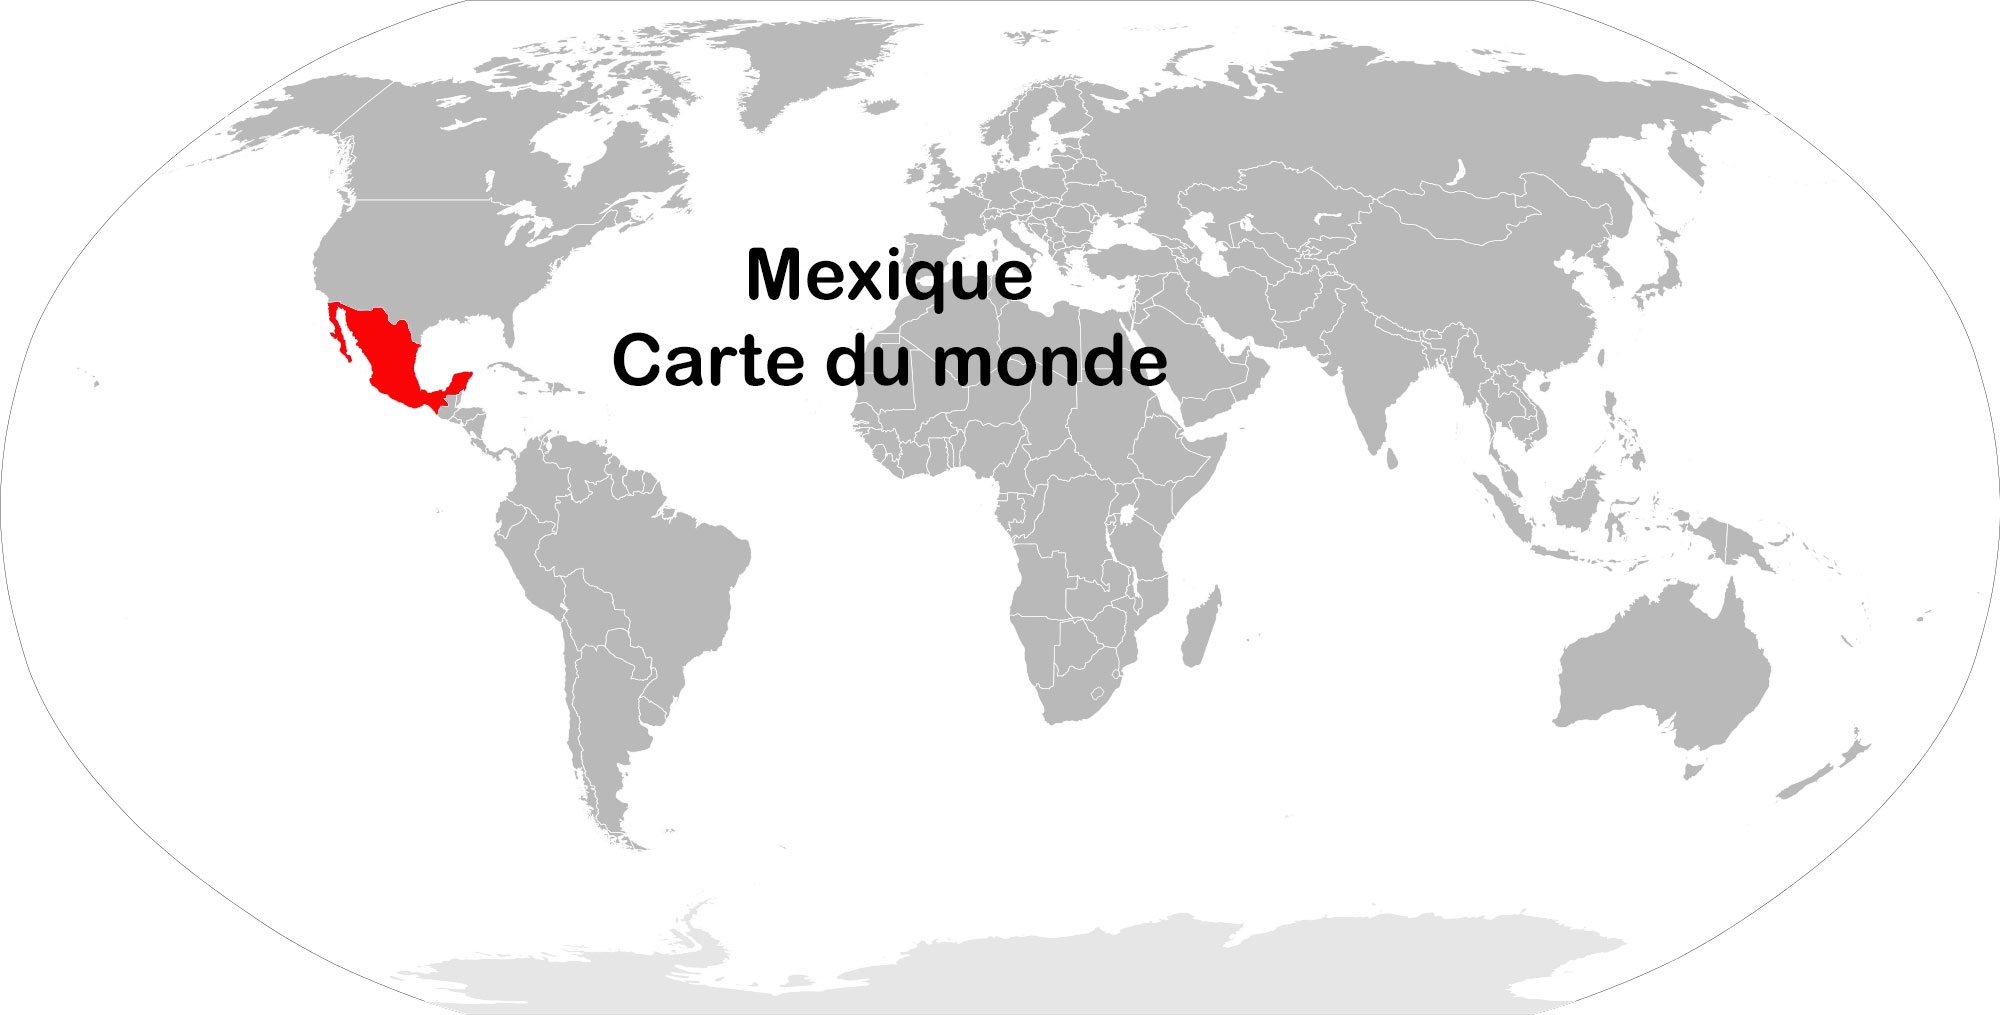 mexique carte du monde Carte du monde Mexique   Voyages   Cartes